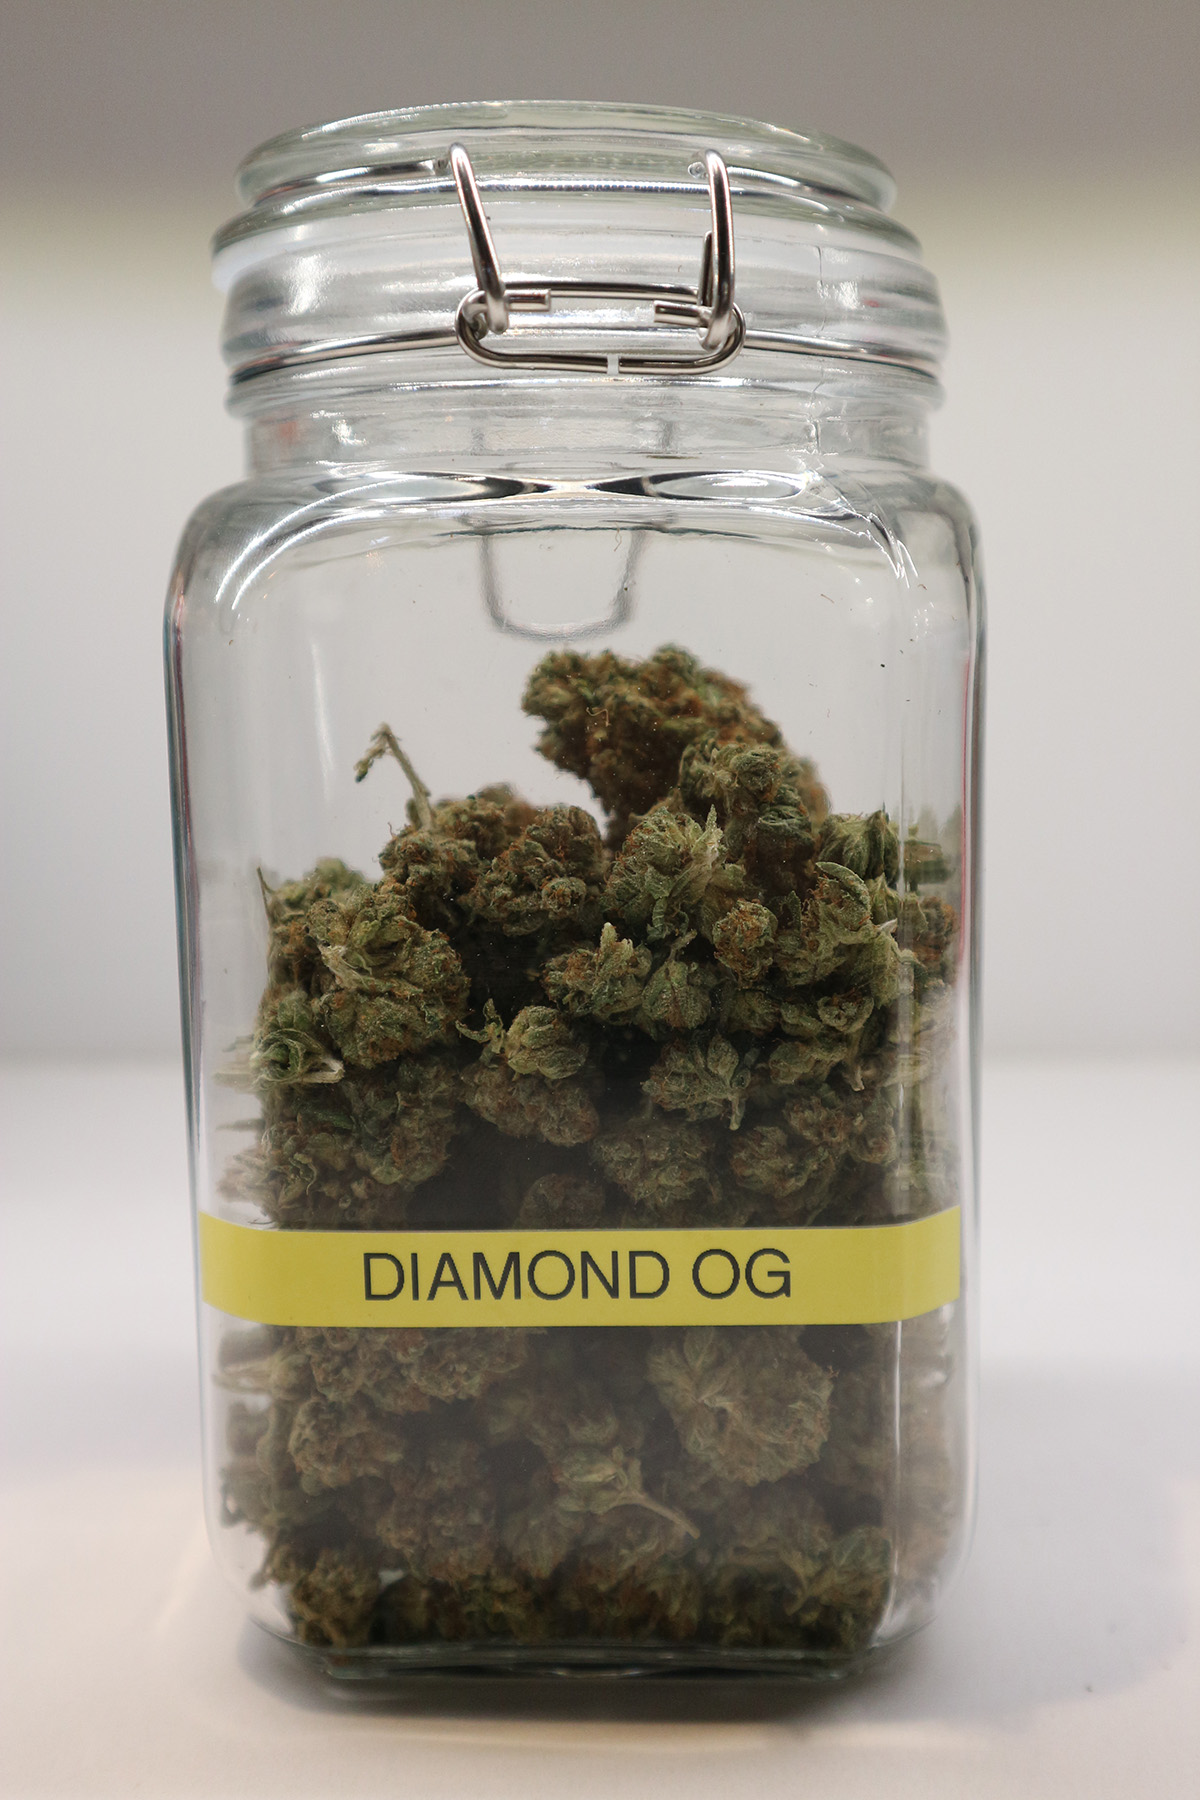 Diamond OG